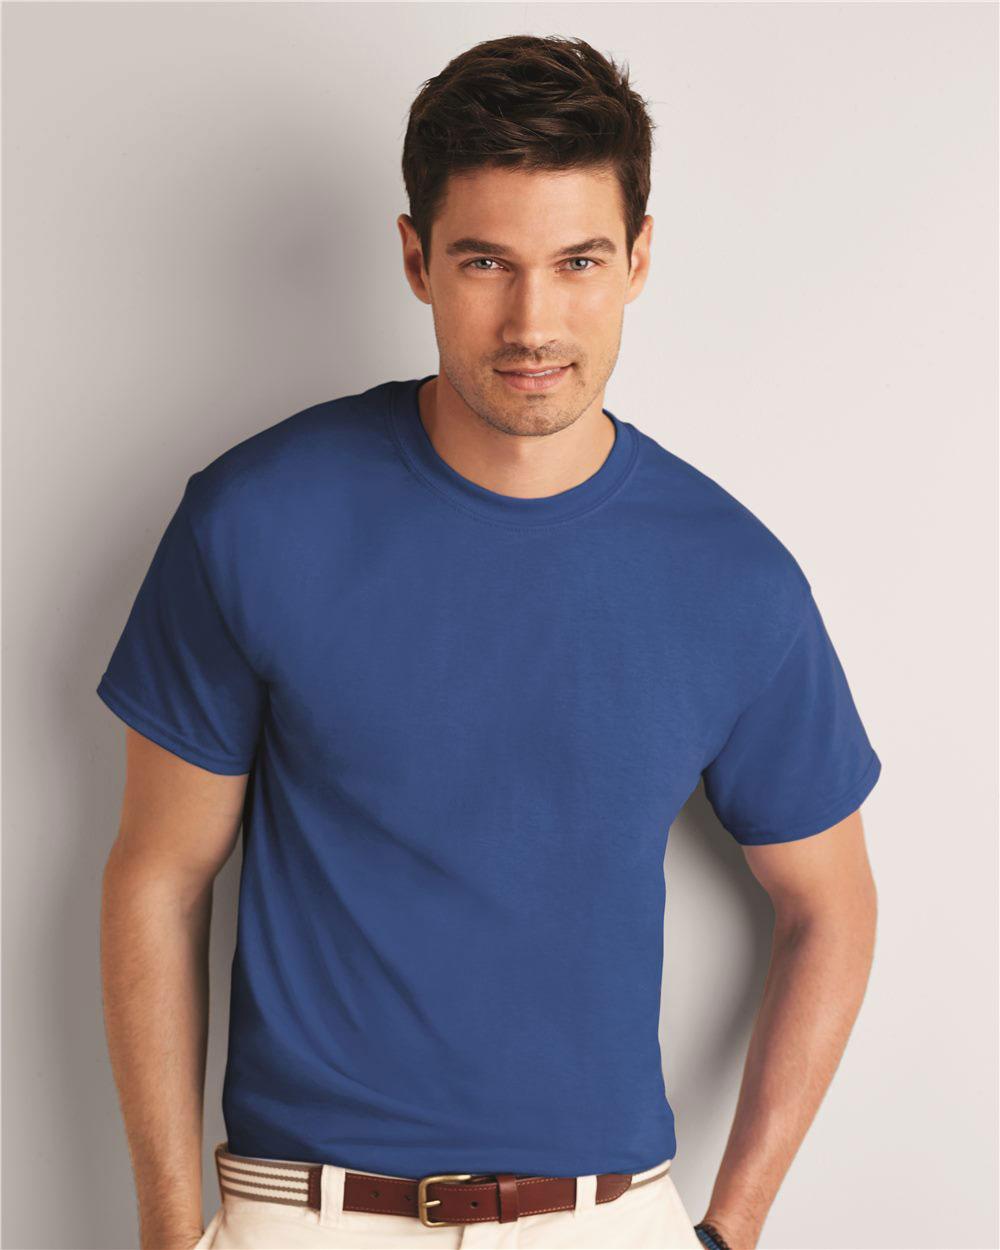 In case of emergency press t shirt gildan 8000 for Gildan 8000 t shirt